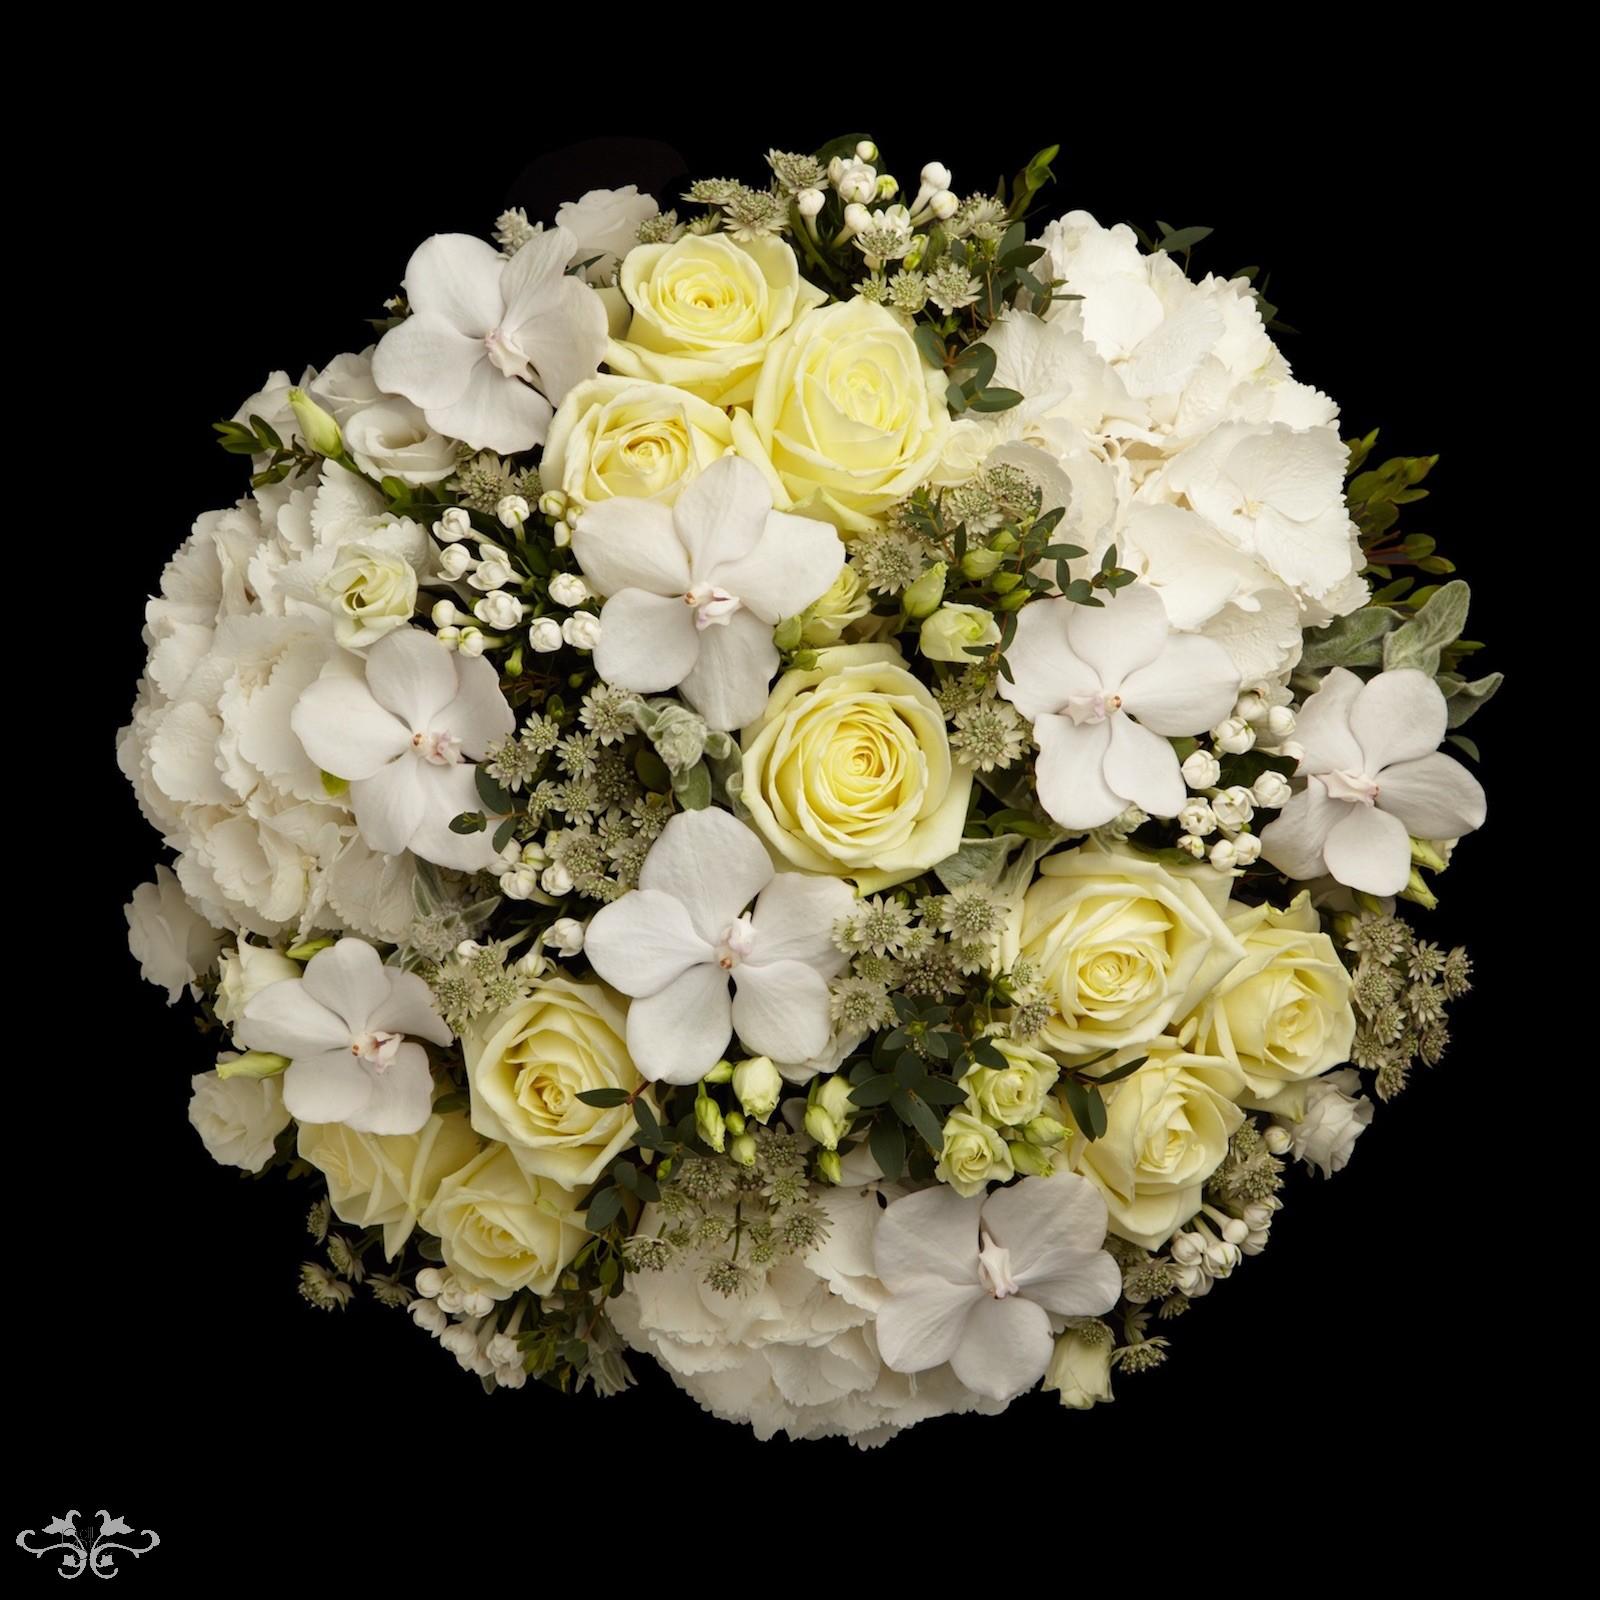 Neill Strain flowers.jpg